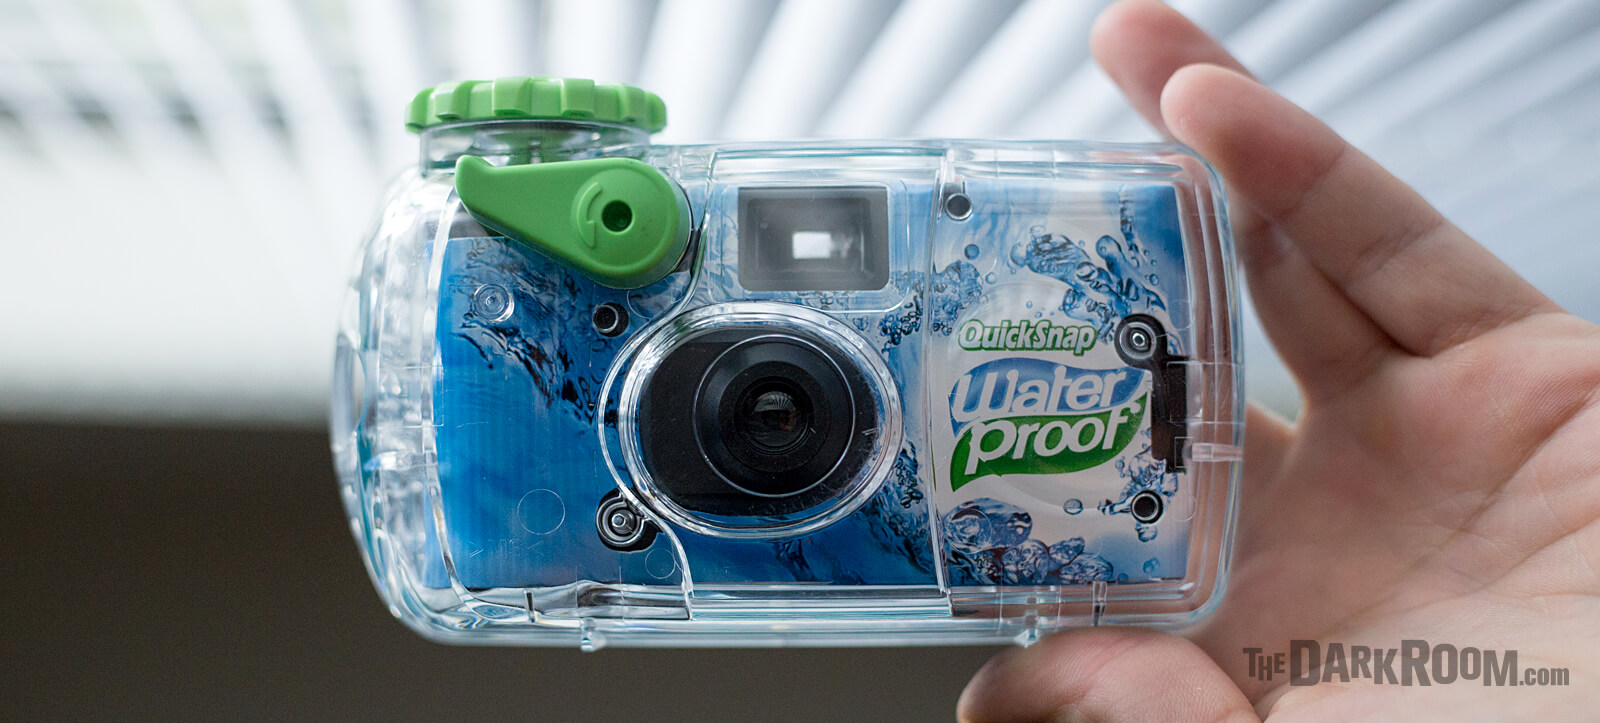 FujiFilm Waterproof QuickSnap Disposable Camera